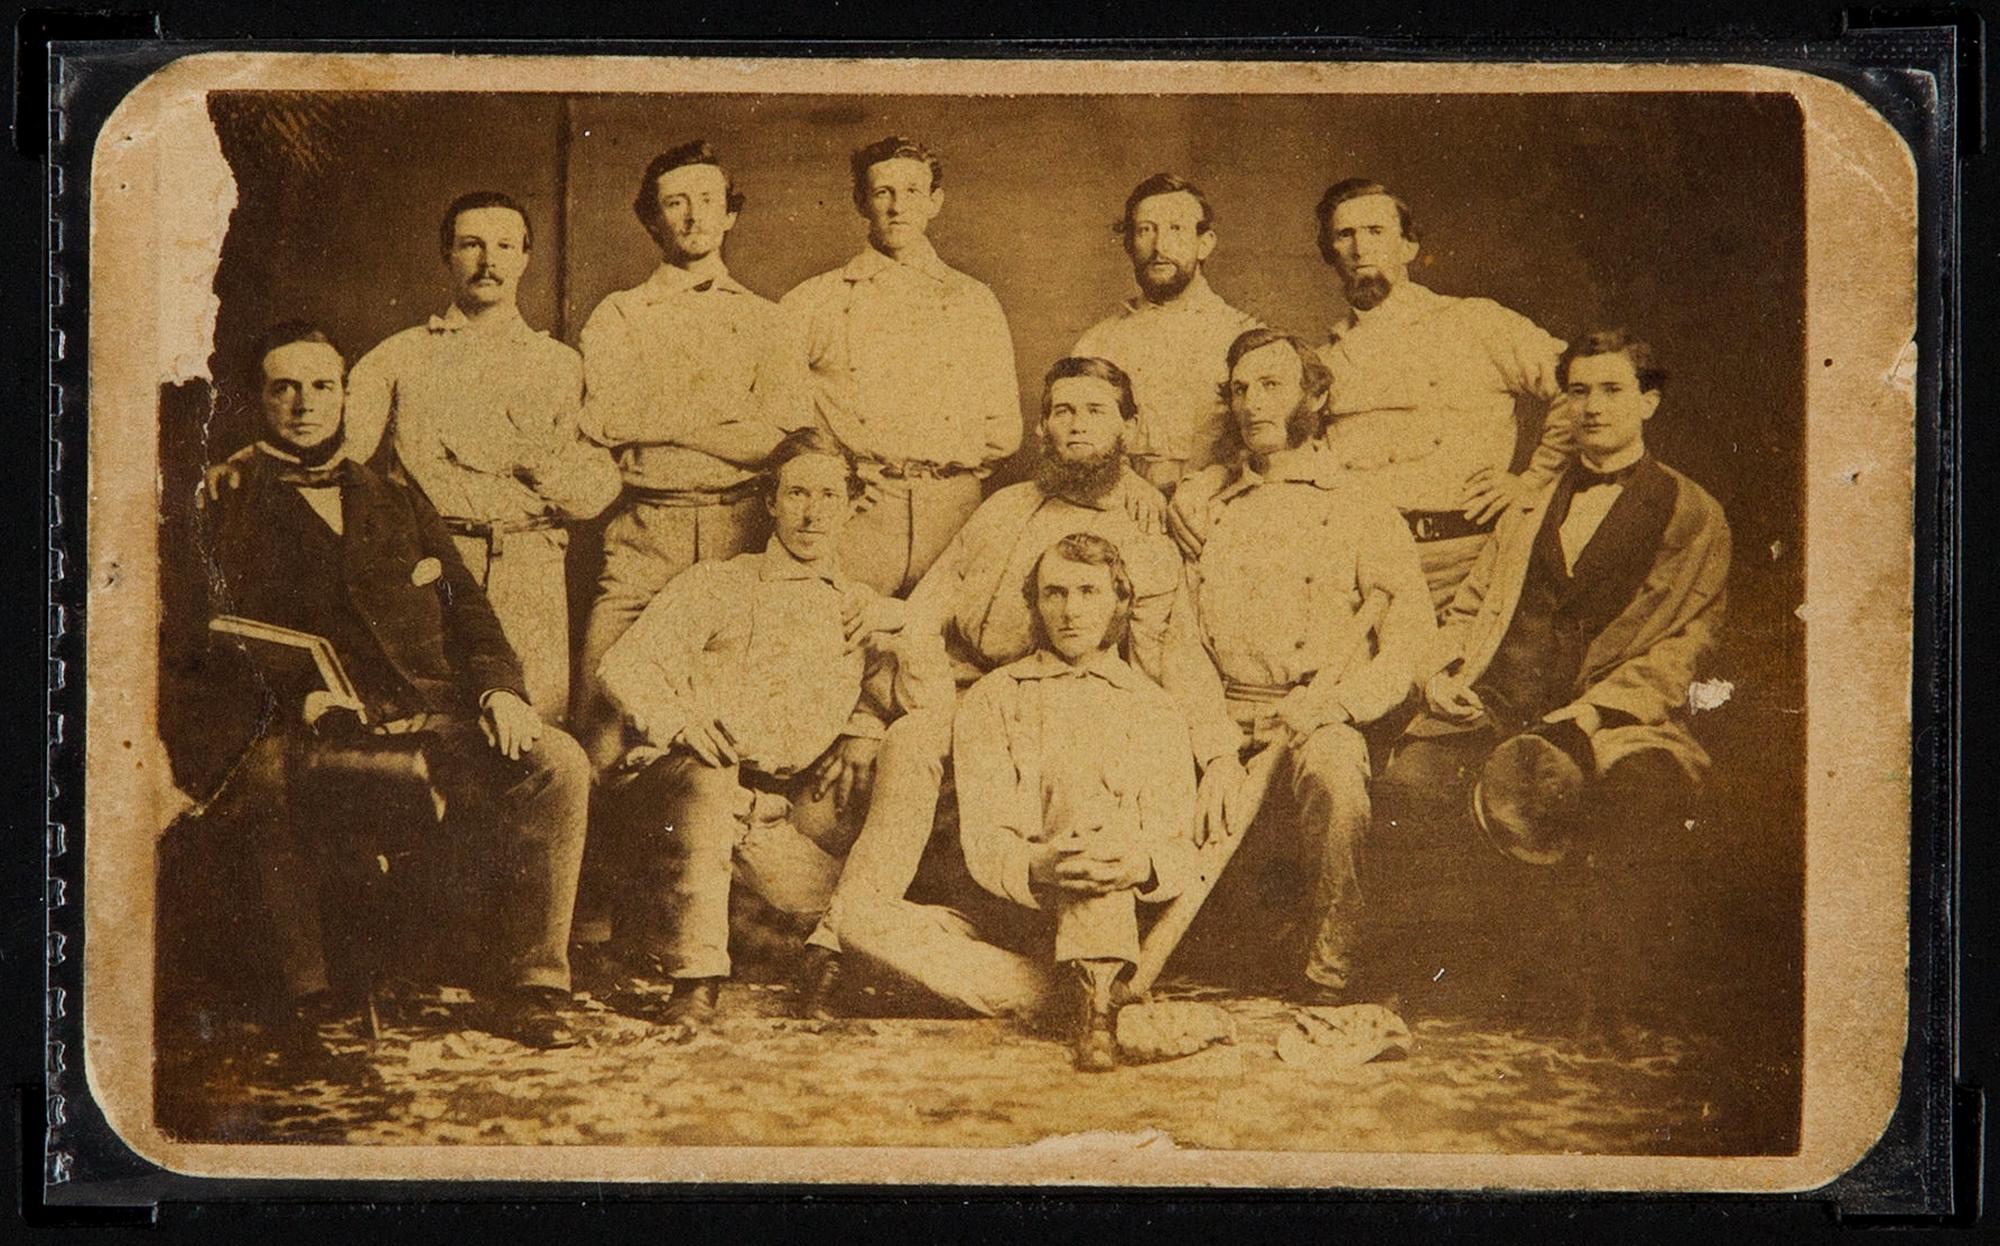 Pre-Civil War baseball team card going on the auction block